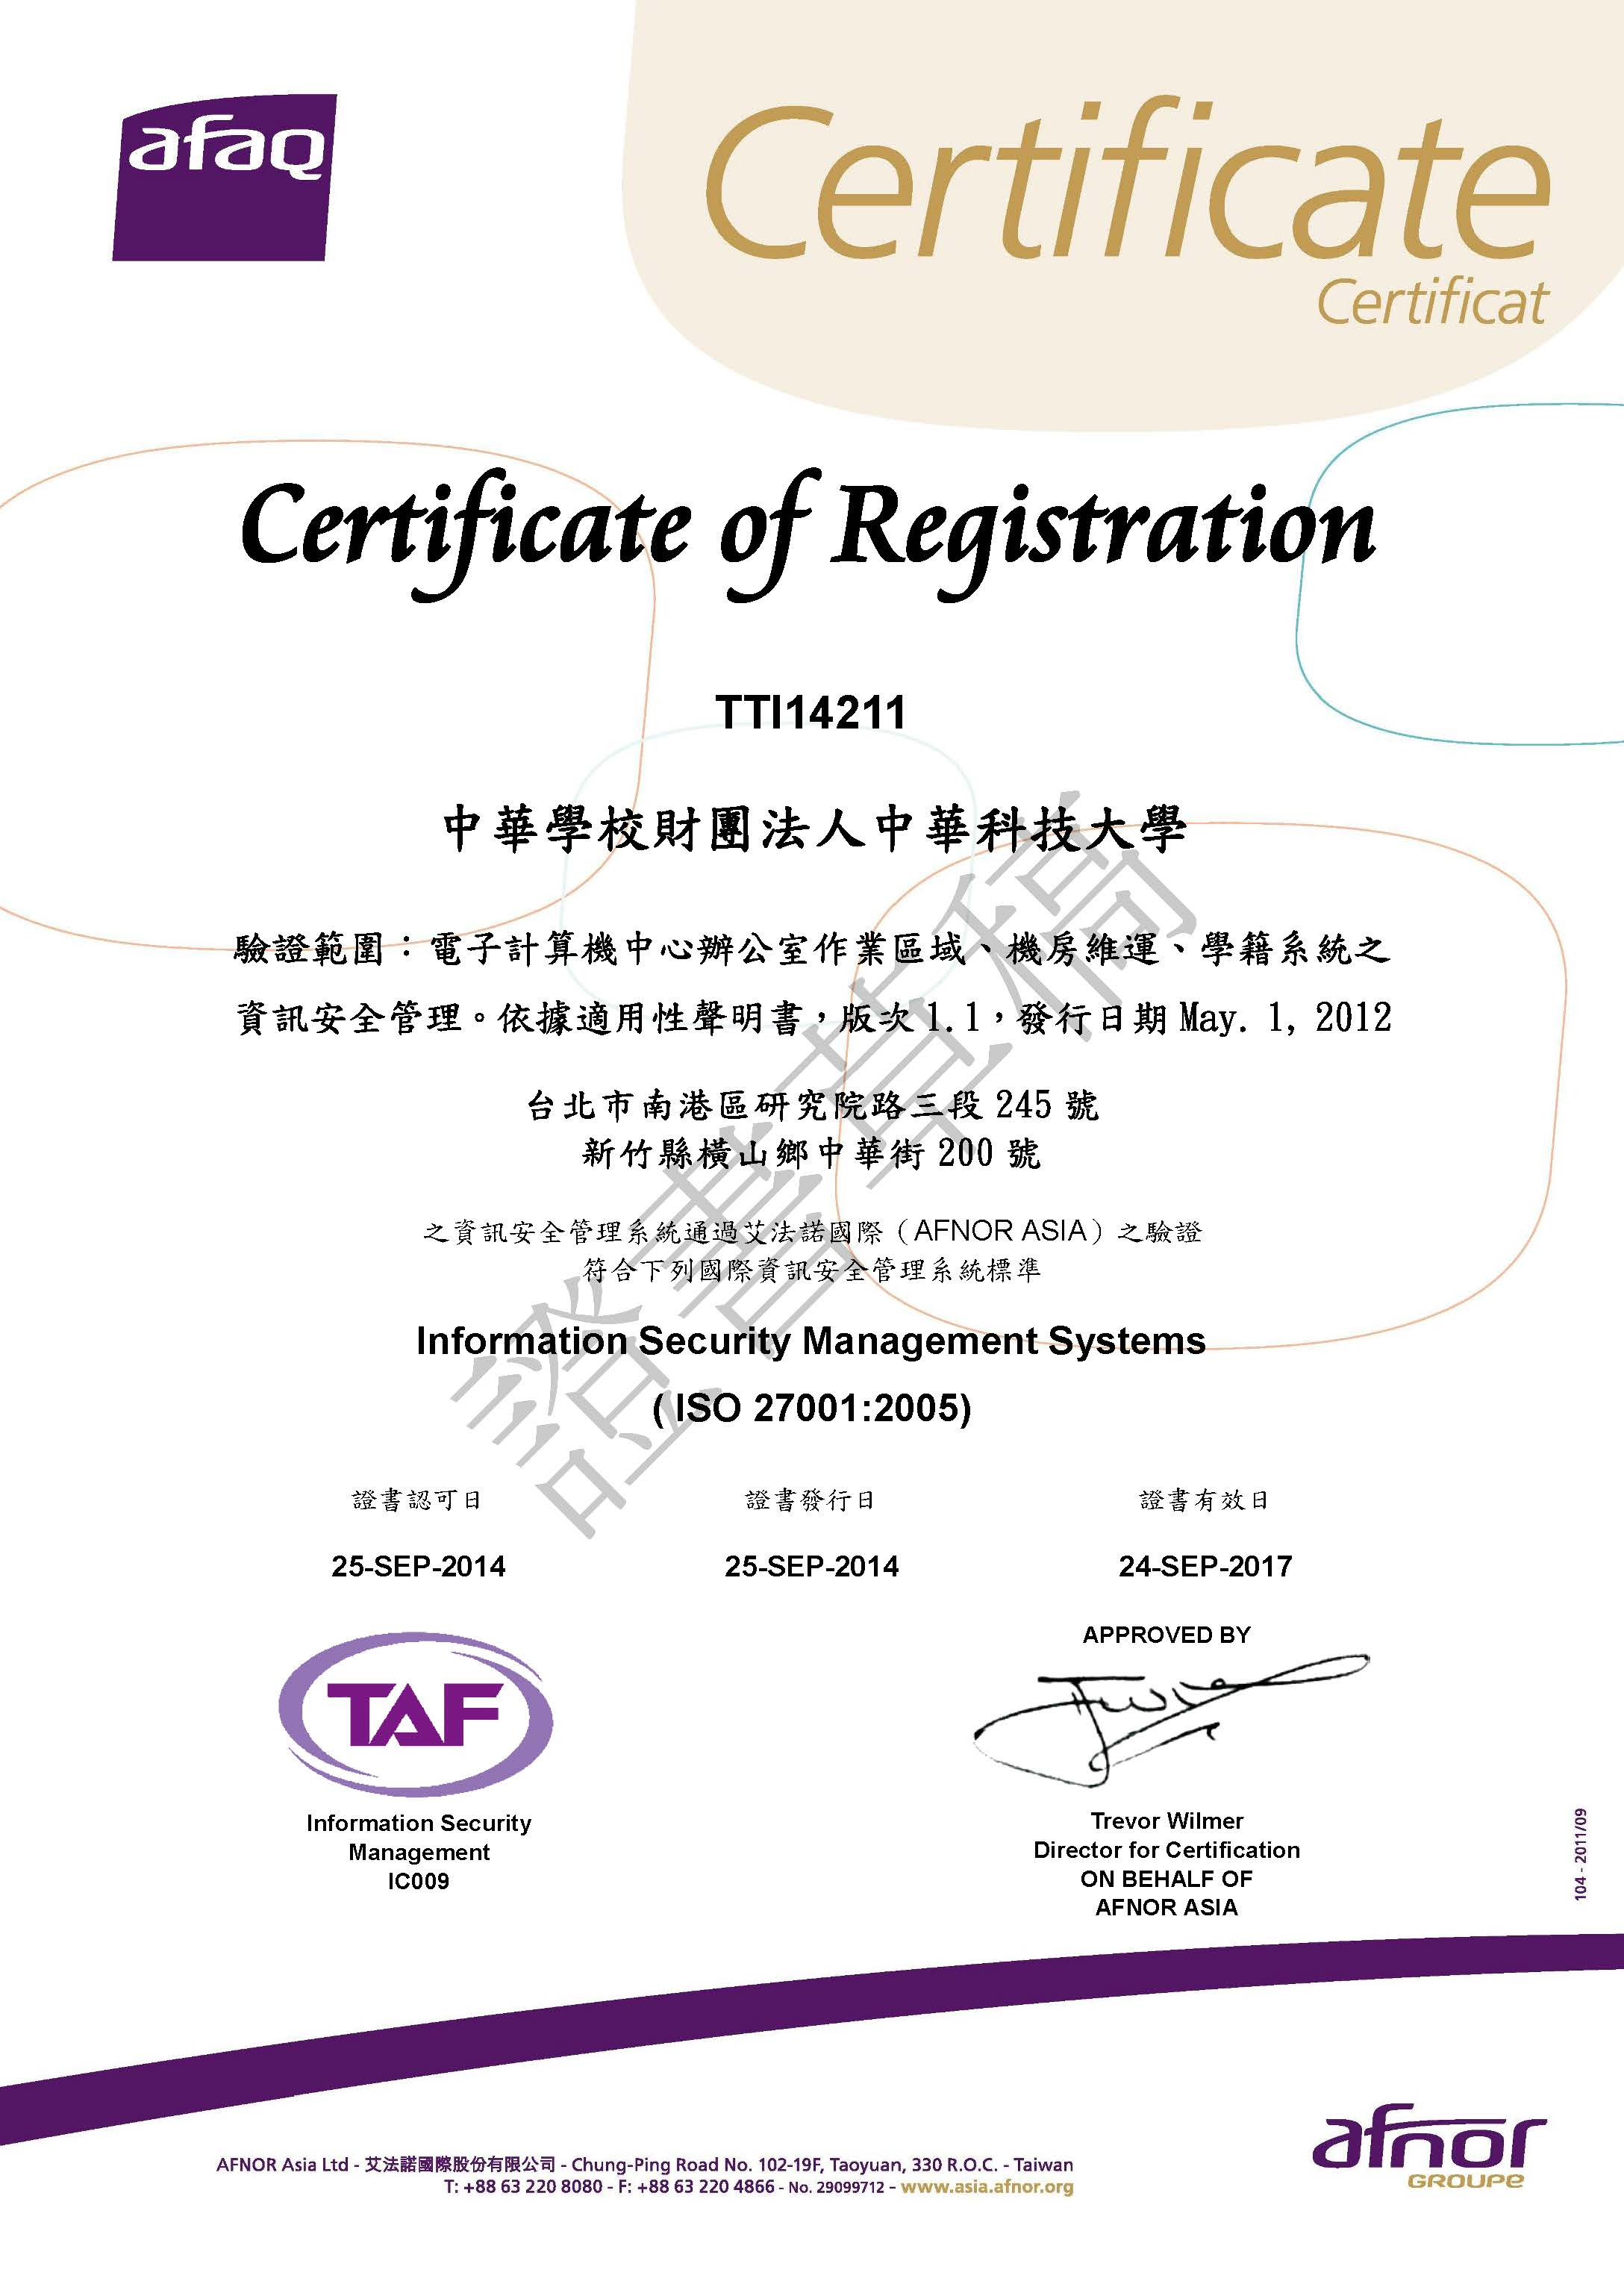 iso證書 - 台灣英日美國際有限公司